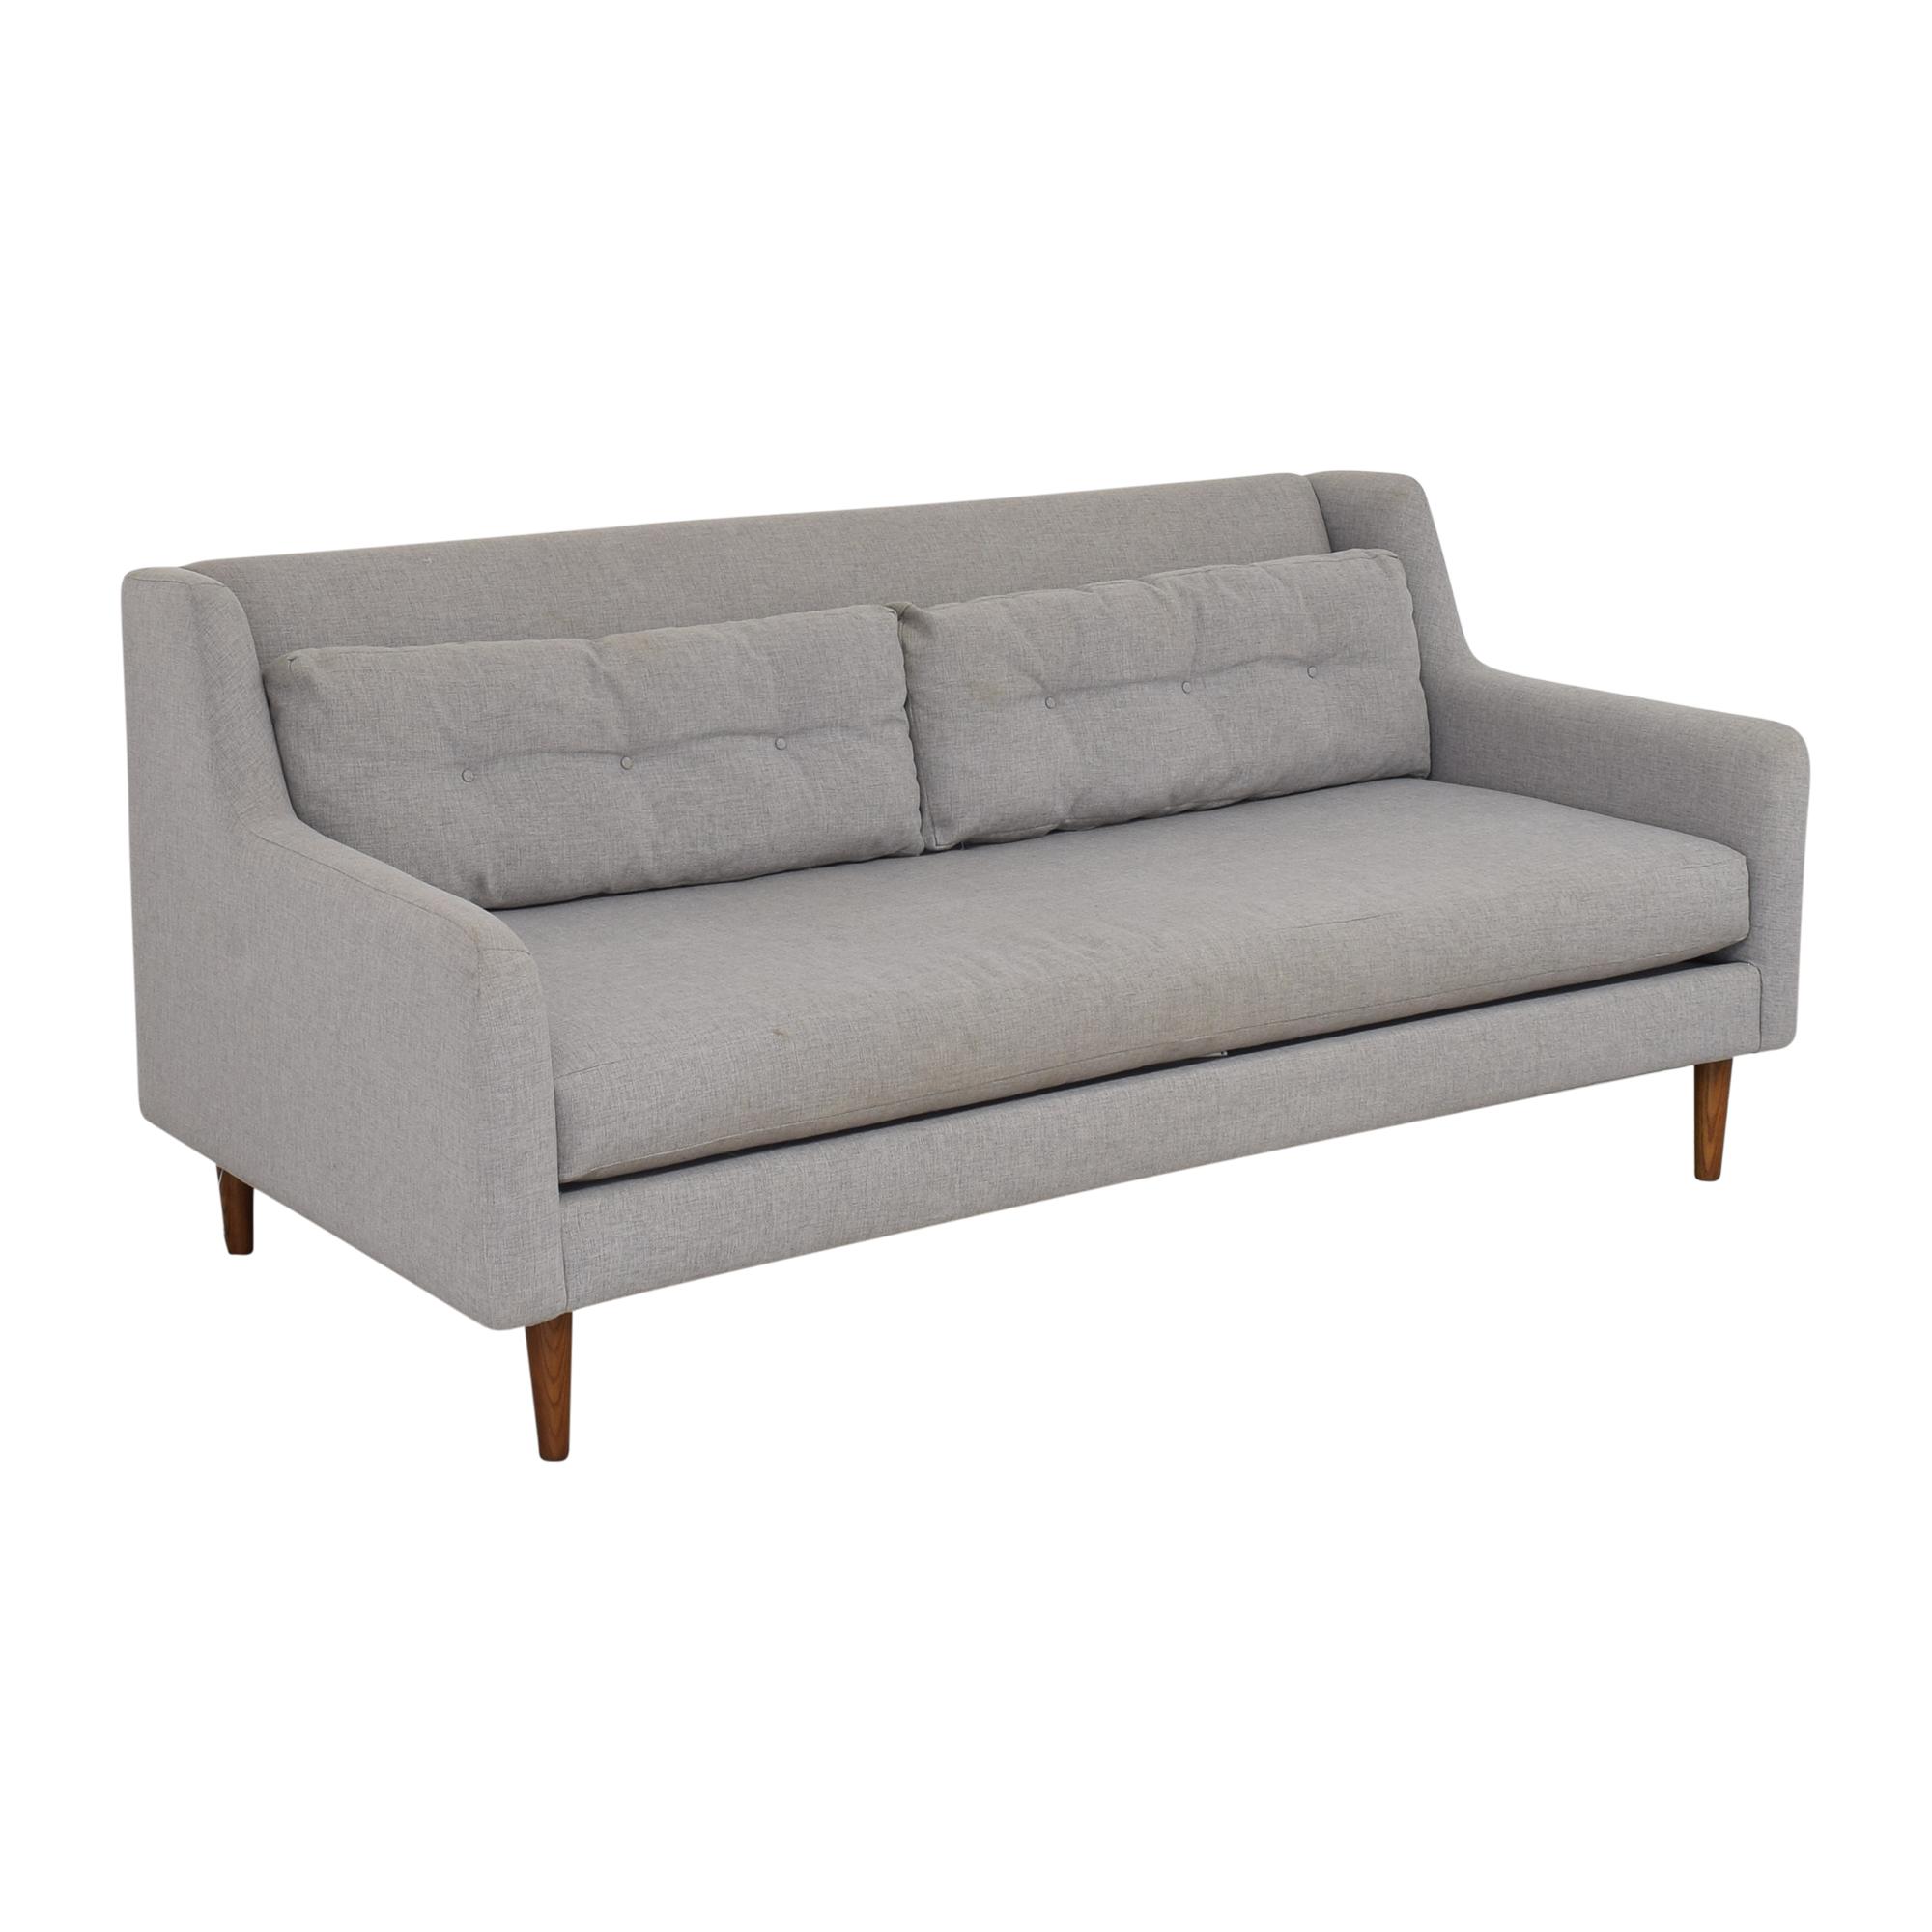 West Elm West Elm Crosby Mid Century Sofa for sale